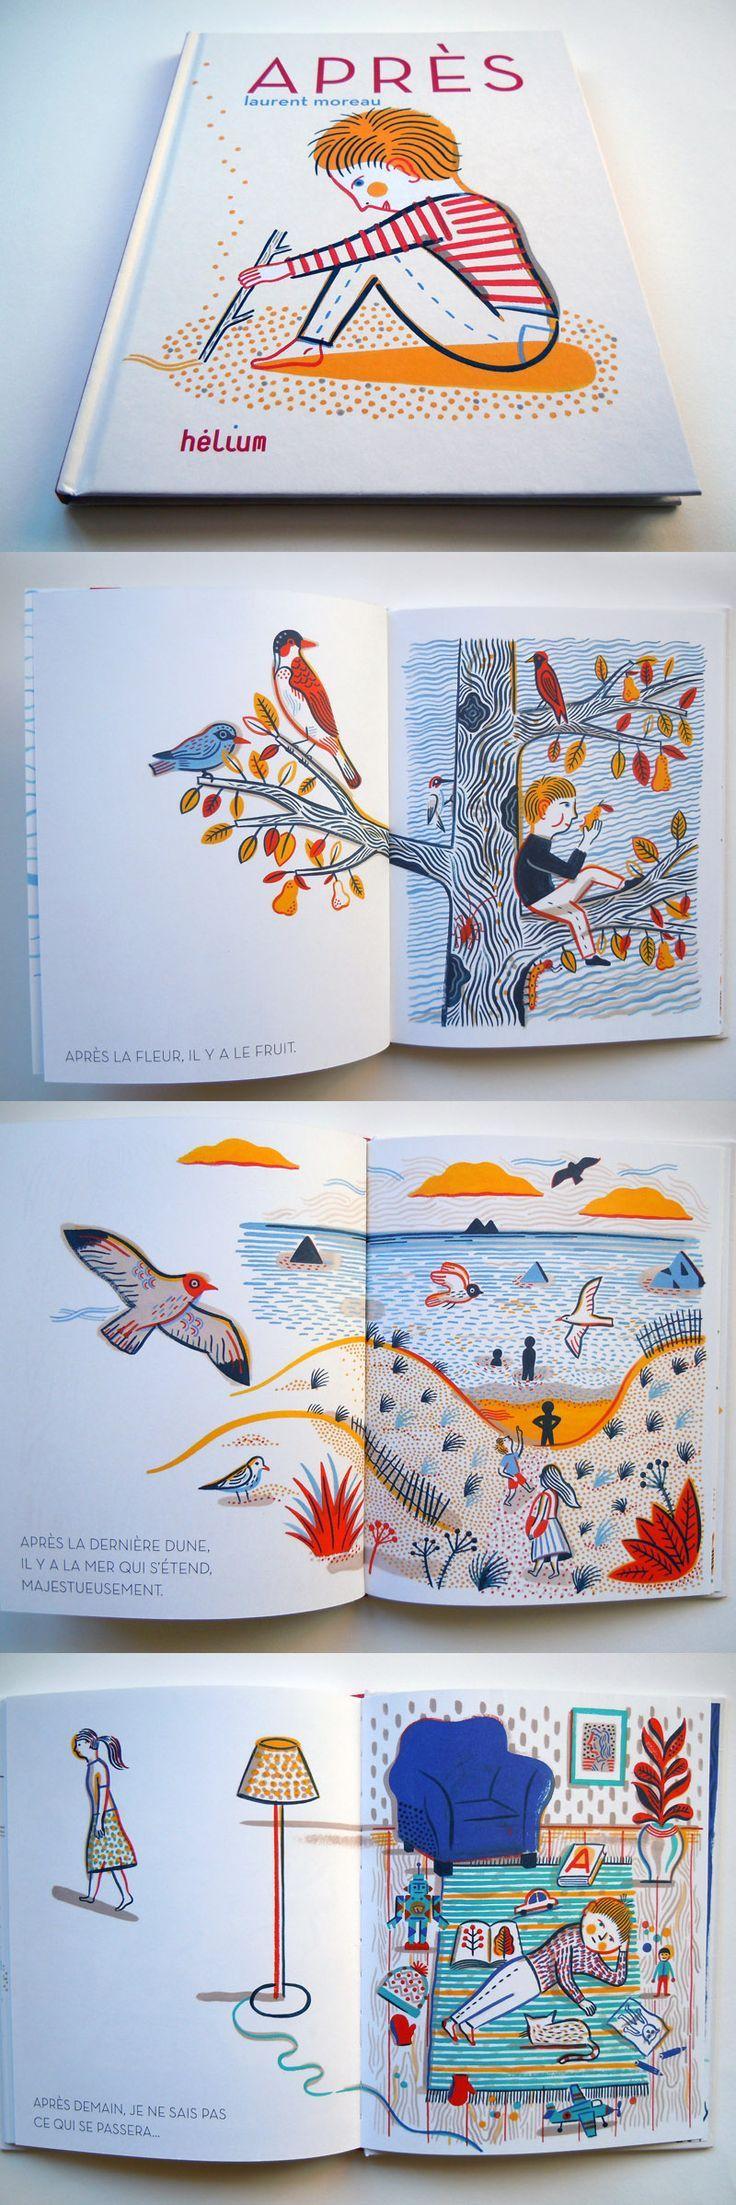 Penguin Book Cover Vector : Best ideas about illustration children on pinterest